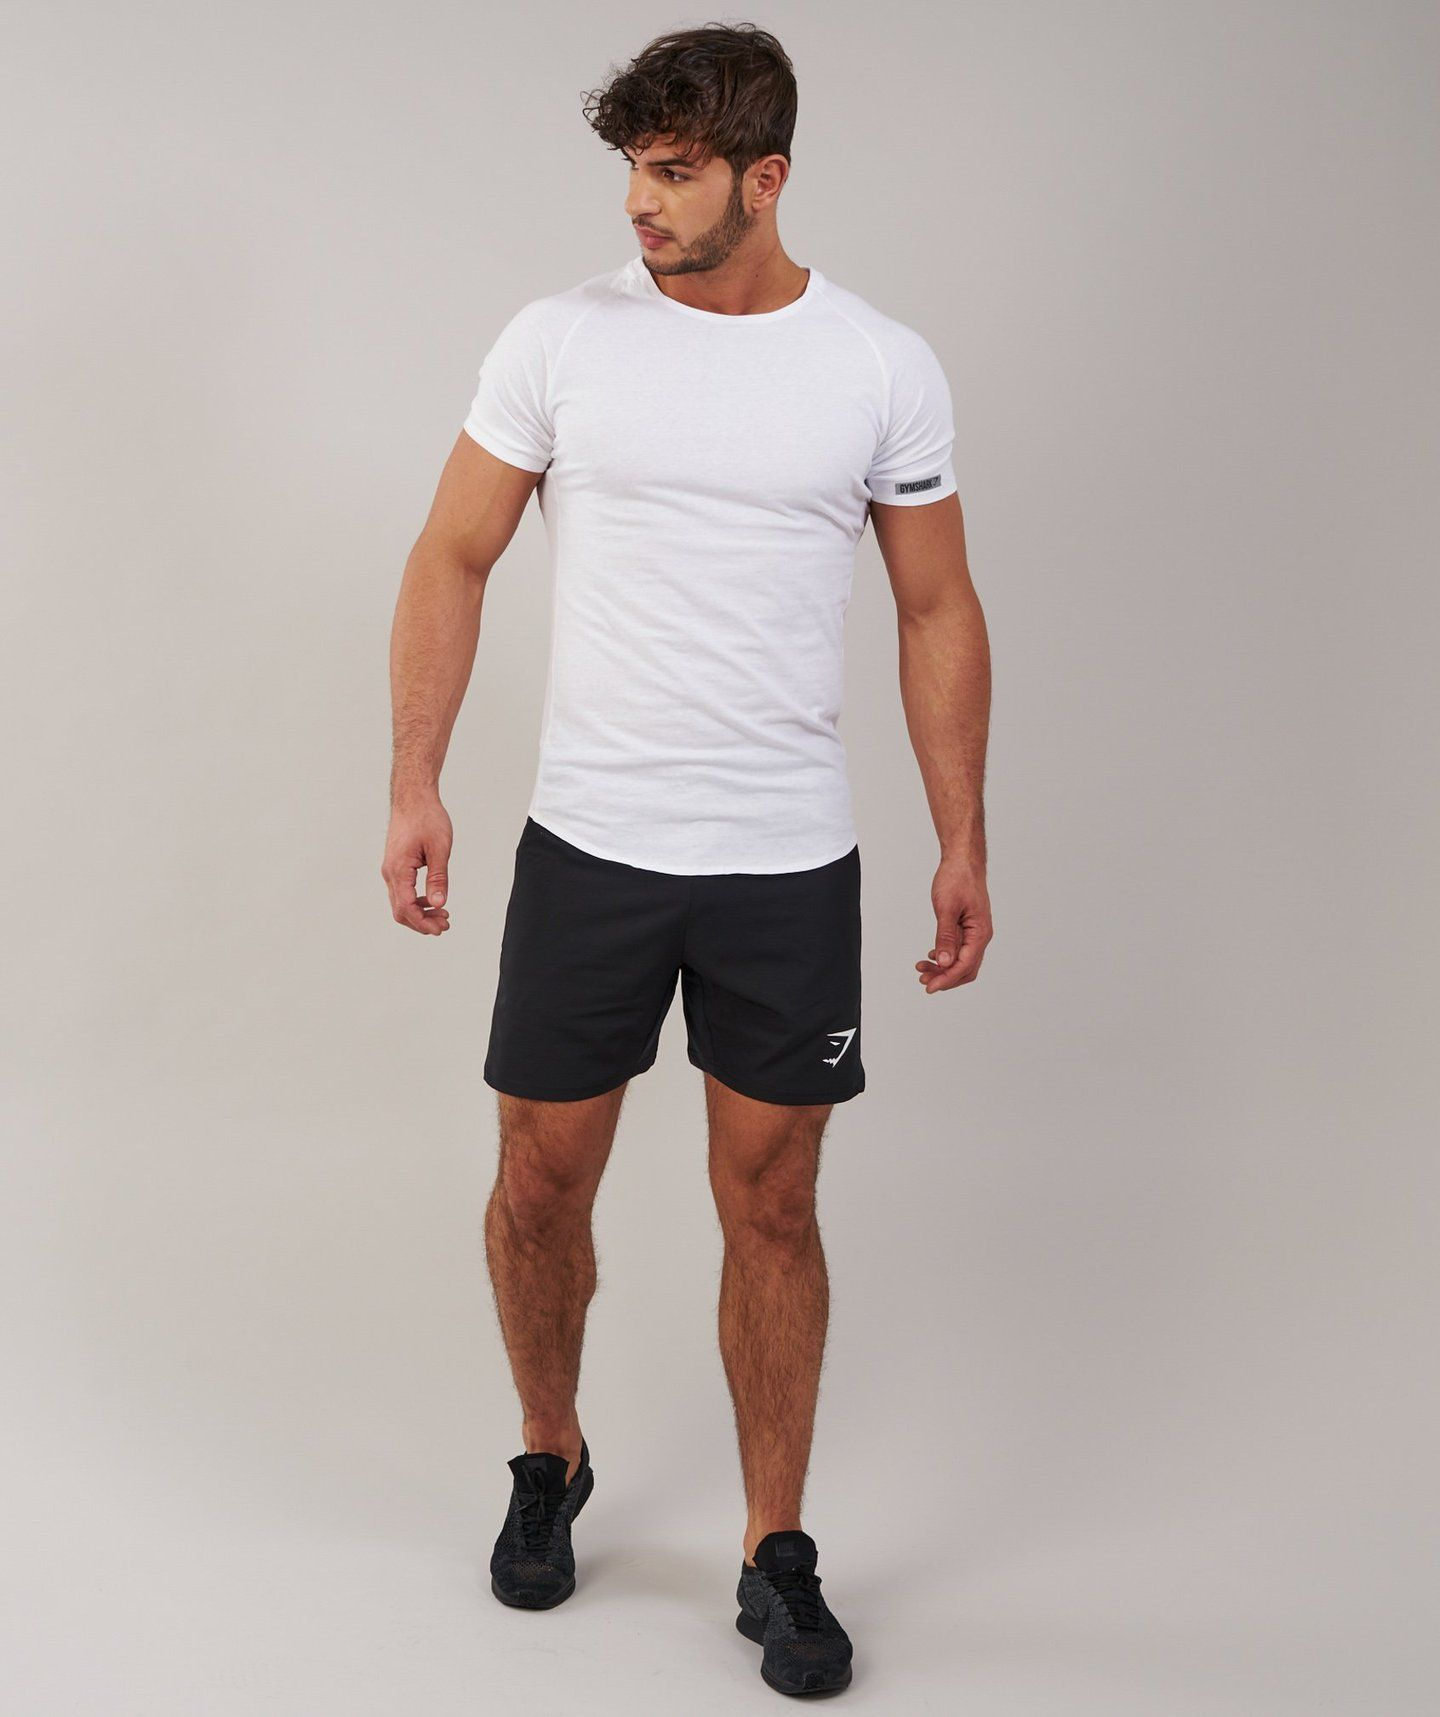 Gymshark Sport Shorts - Black in 2020   Gym wear men ...